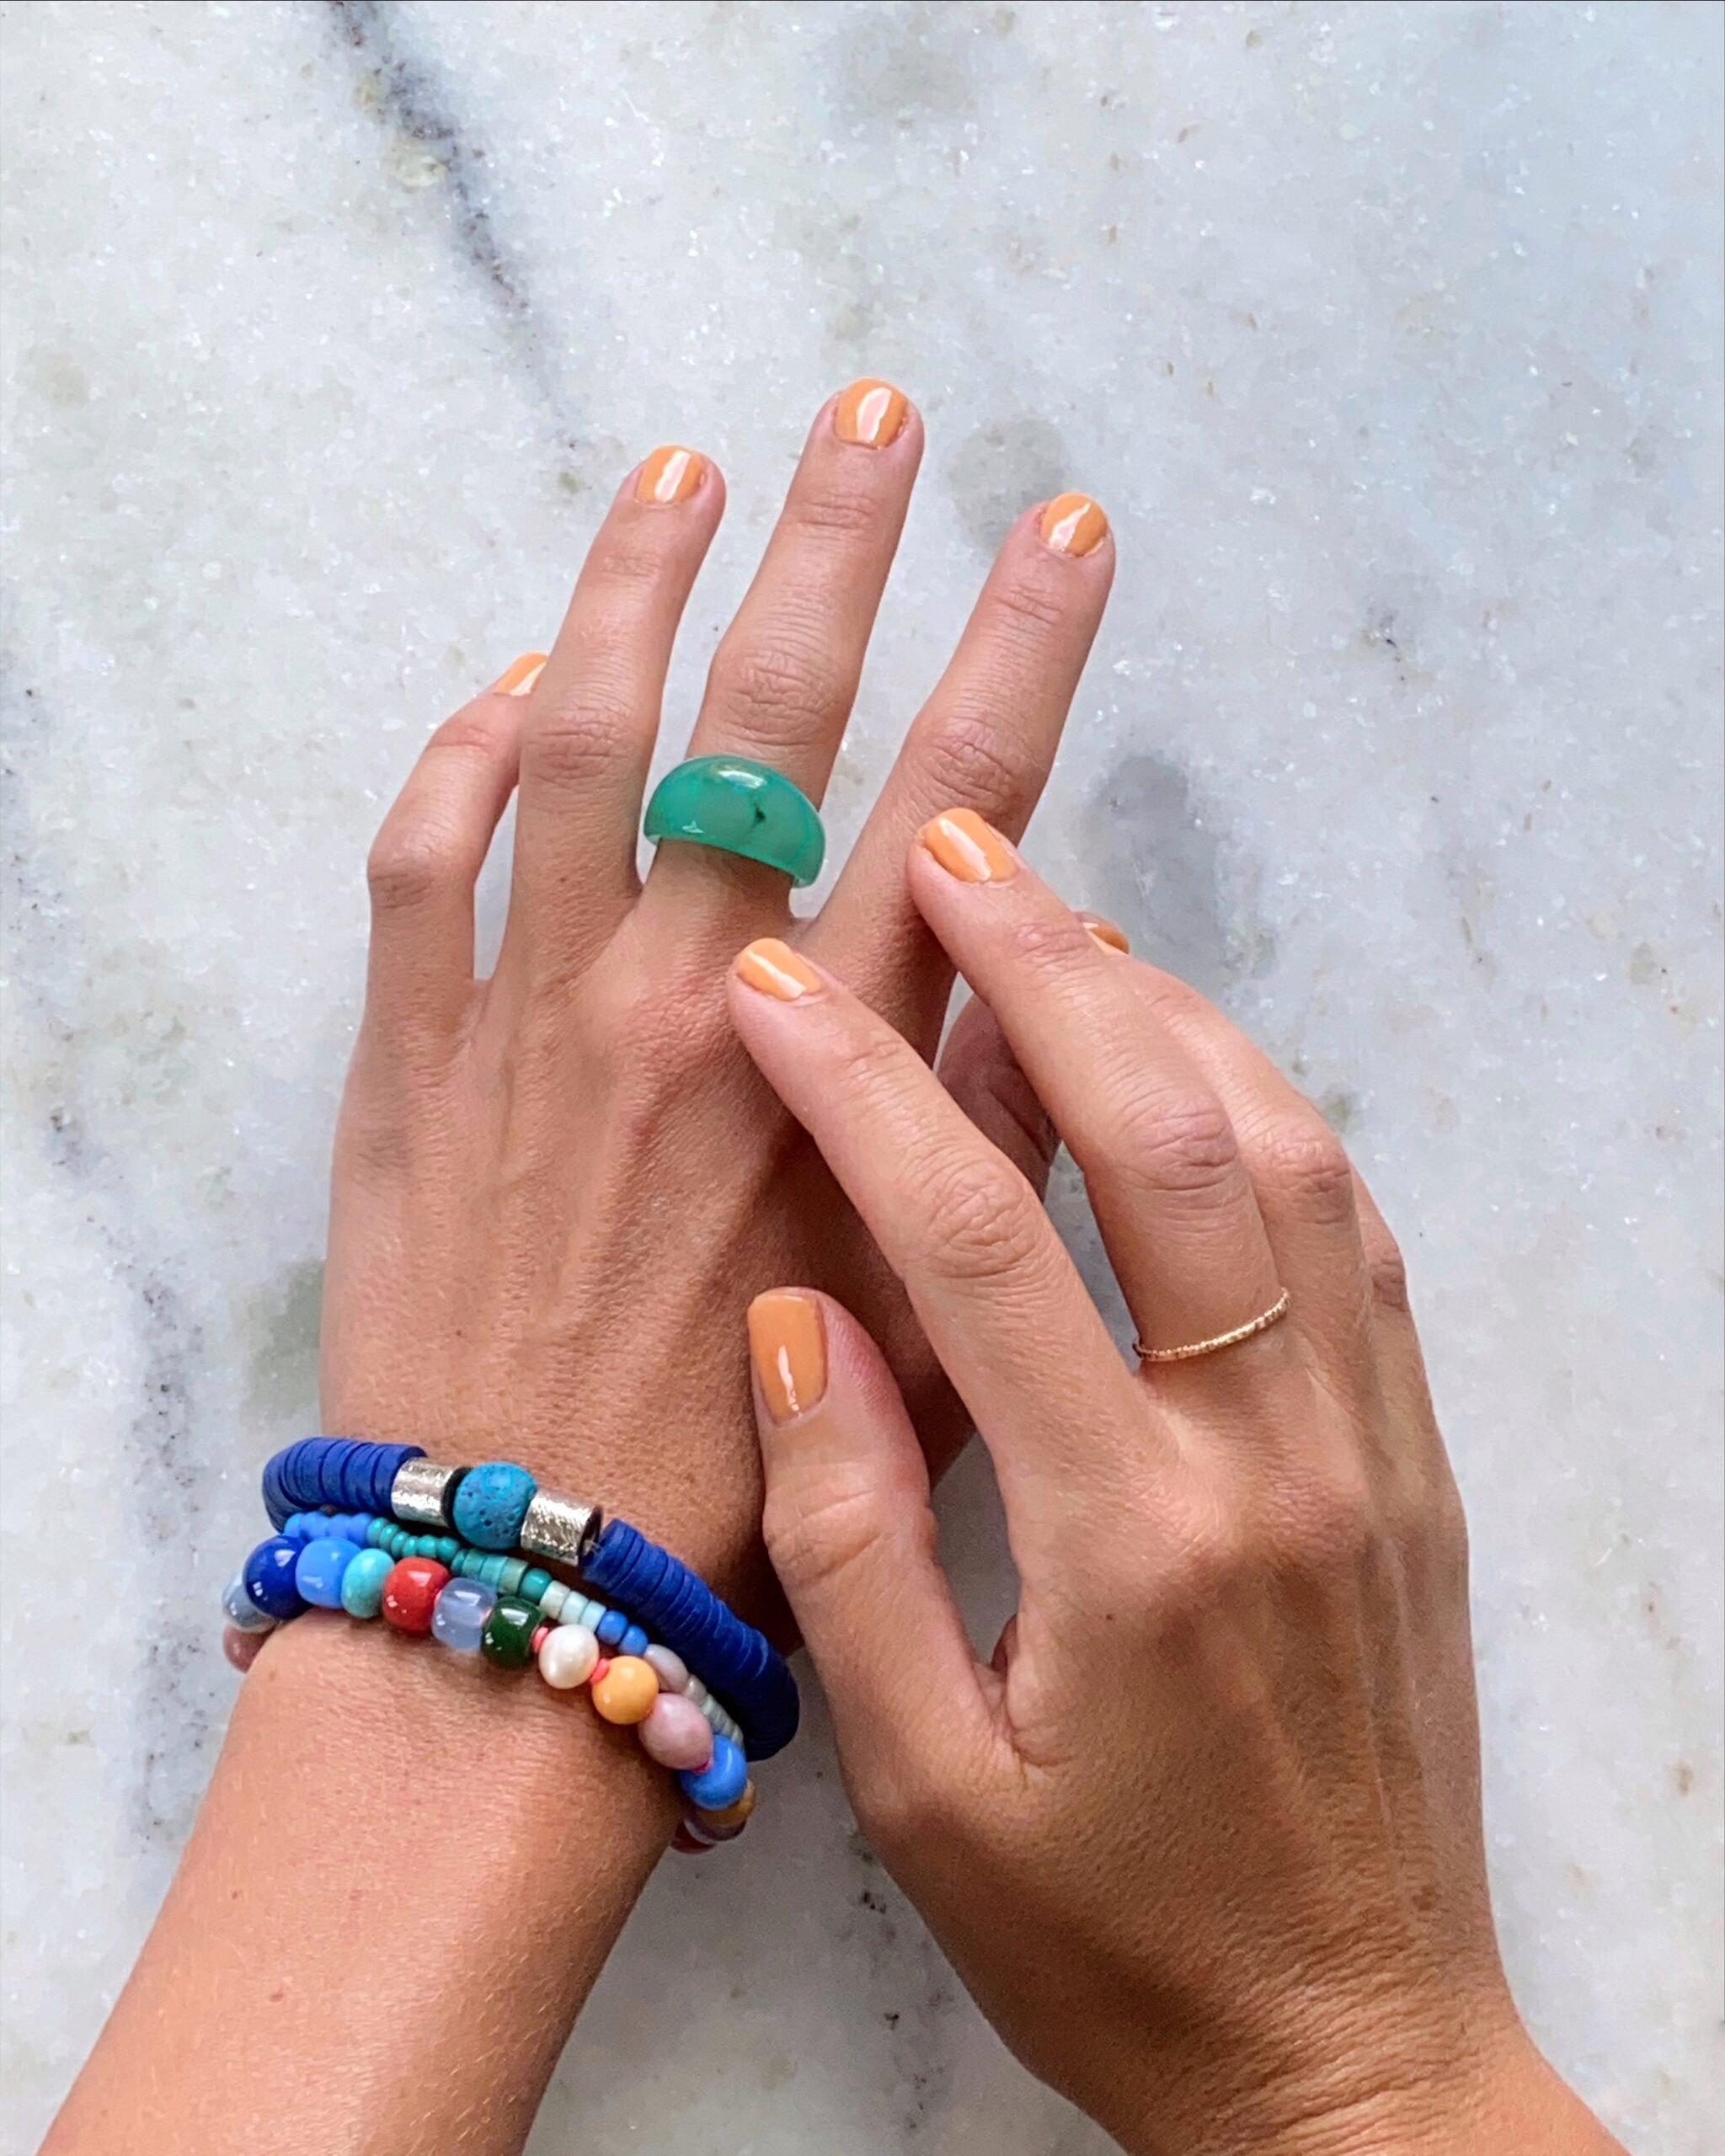 at-home gel manicure kit